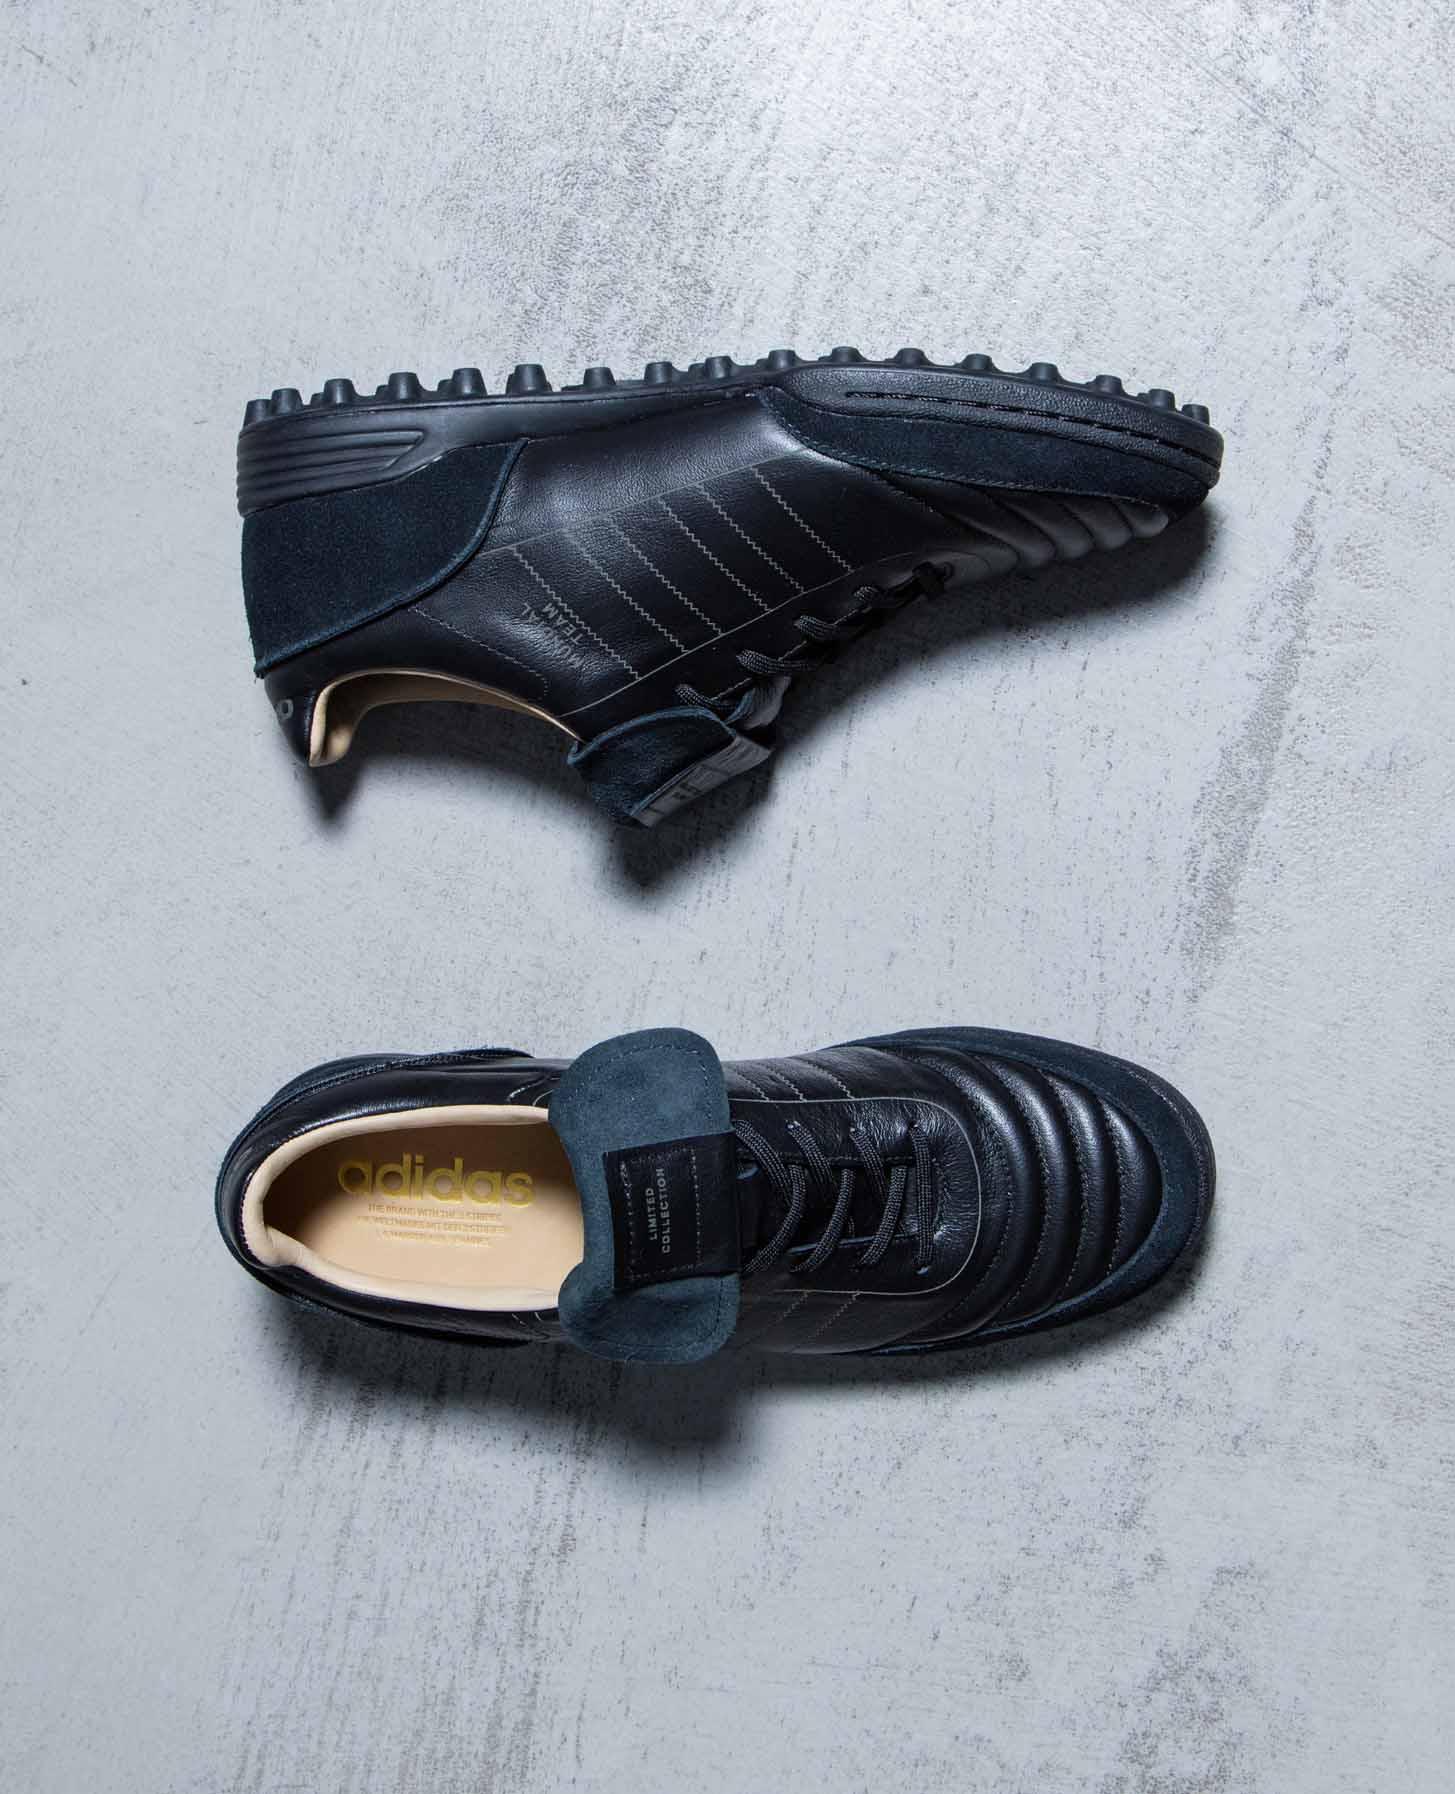 chaussures-football-adidas-copa-mundial-team-modern-craft-img2